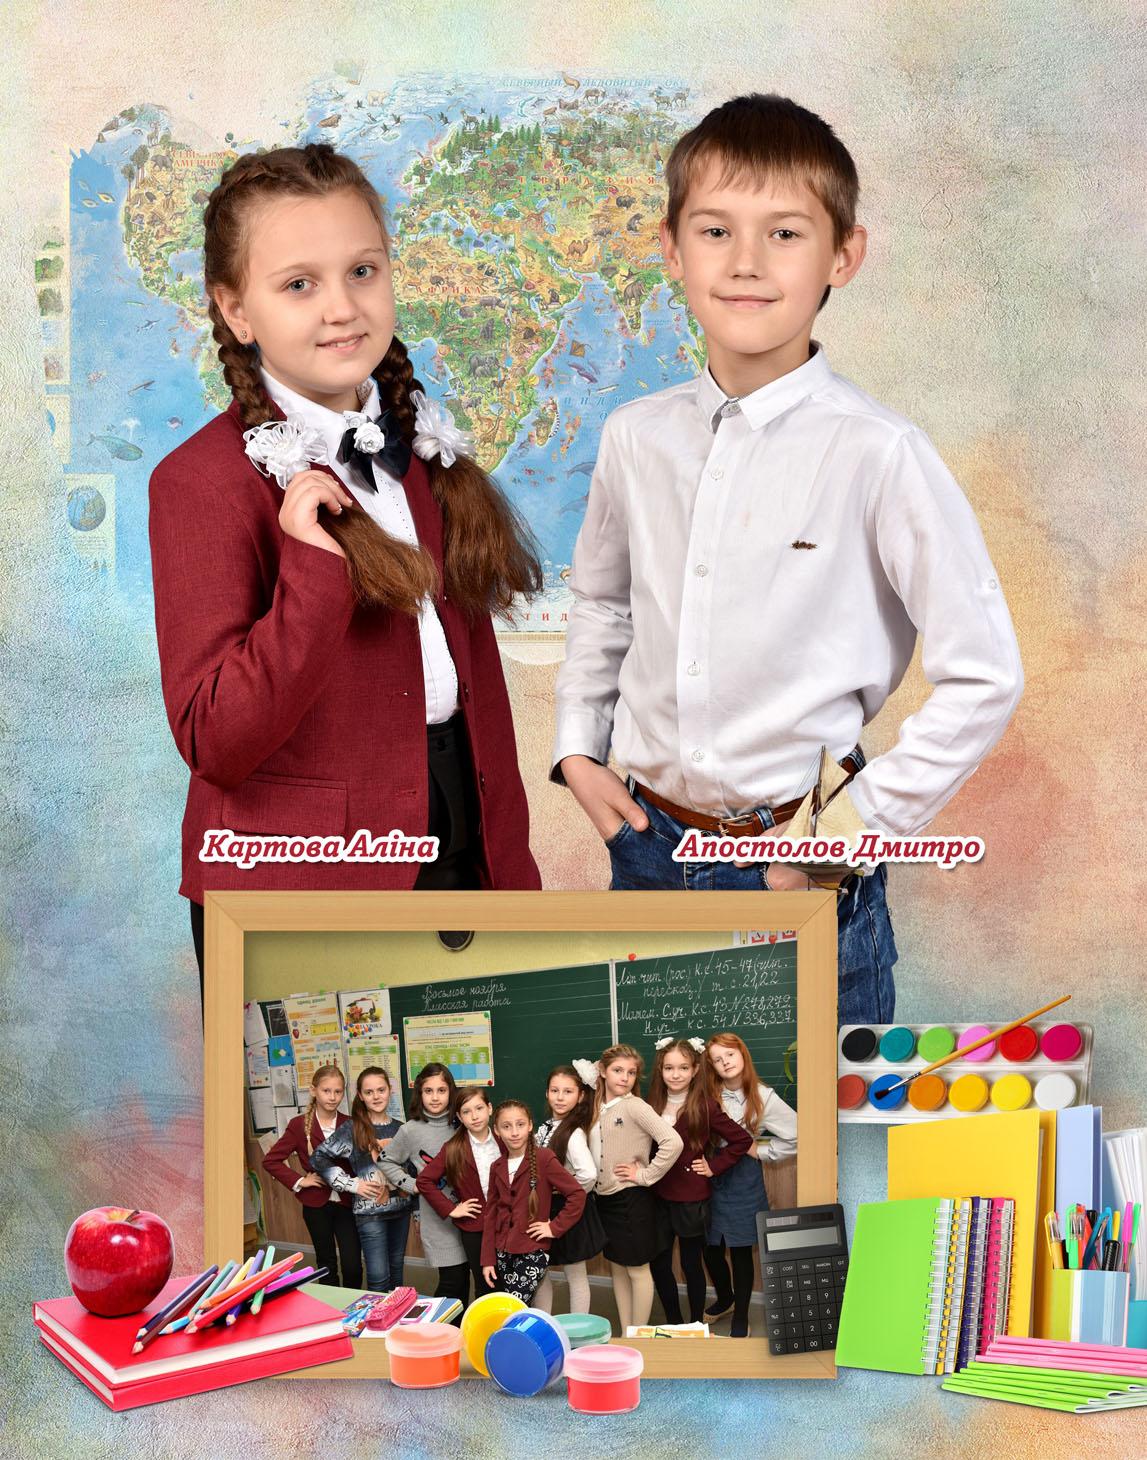 https://school-photo.com.ua/wp-content/uploads/2017/09/10-copy-2.jpg